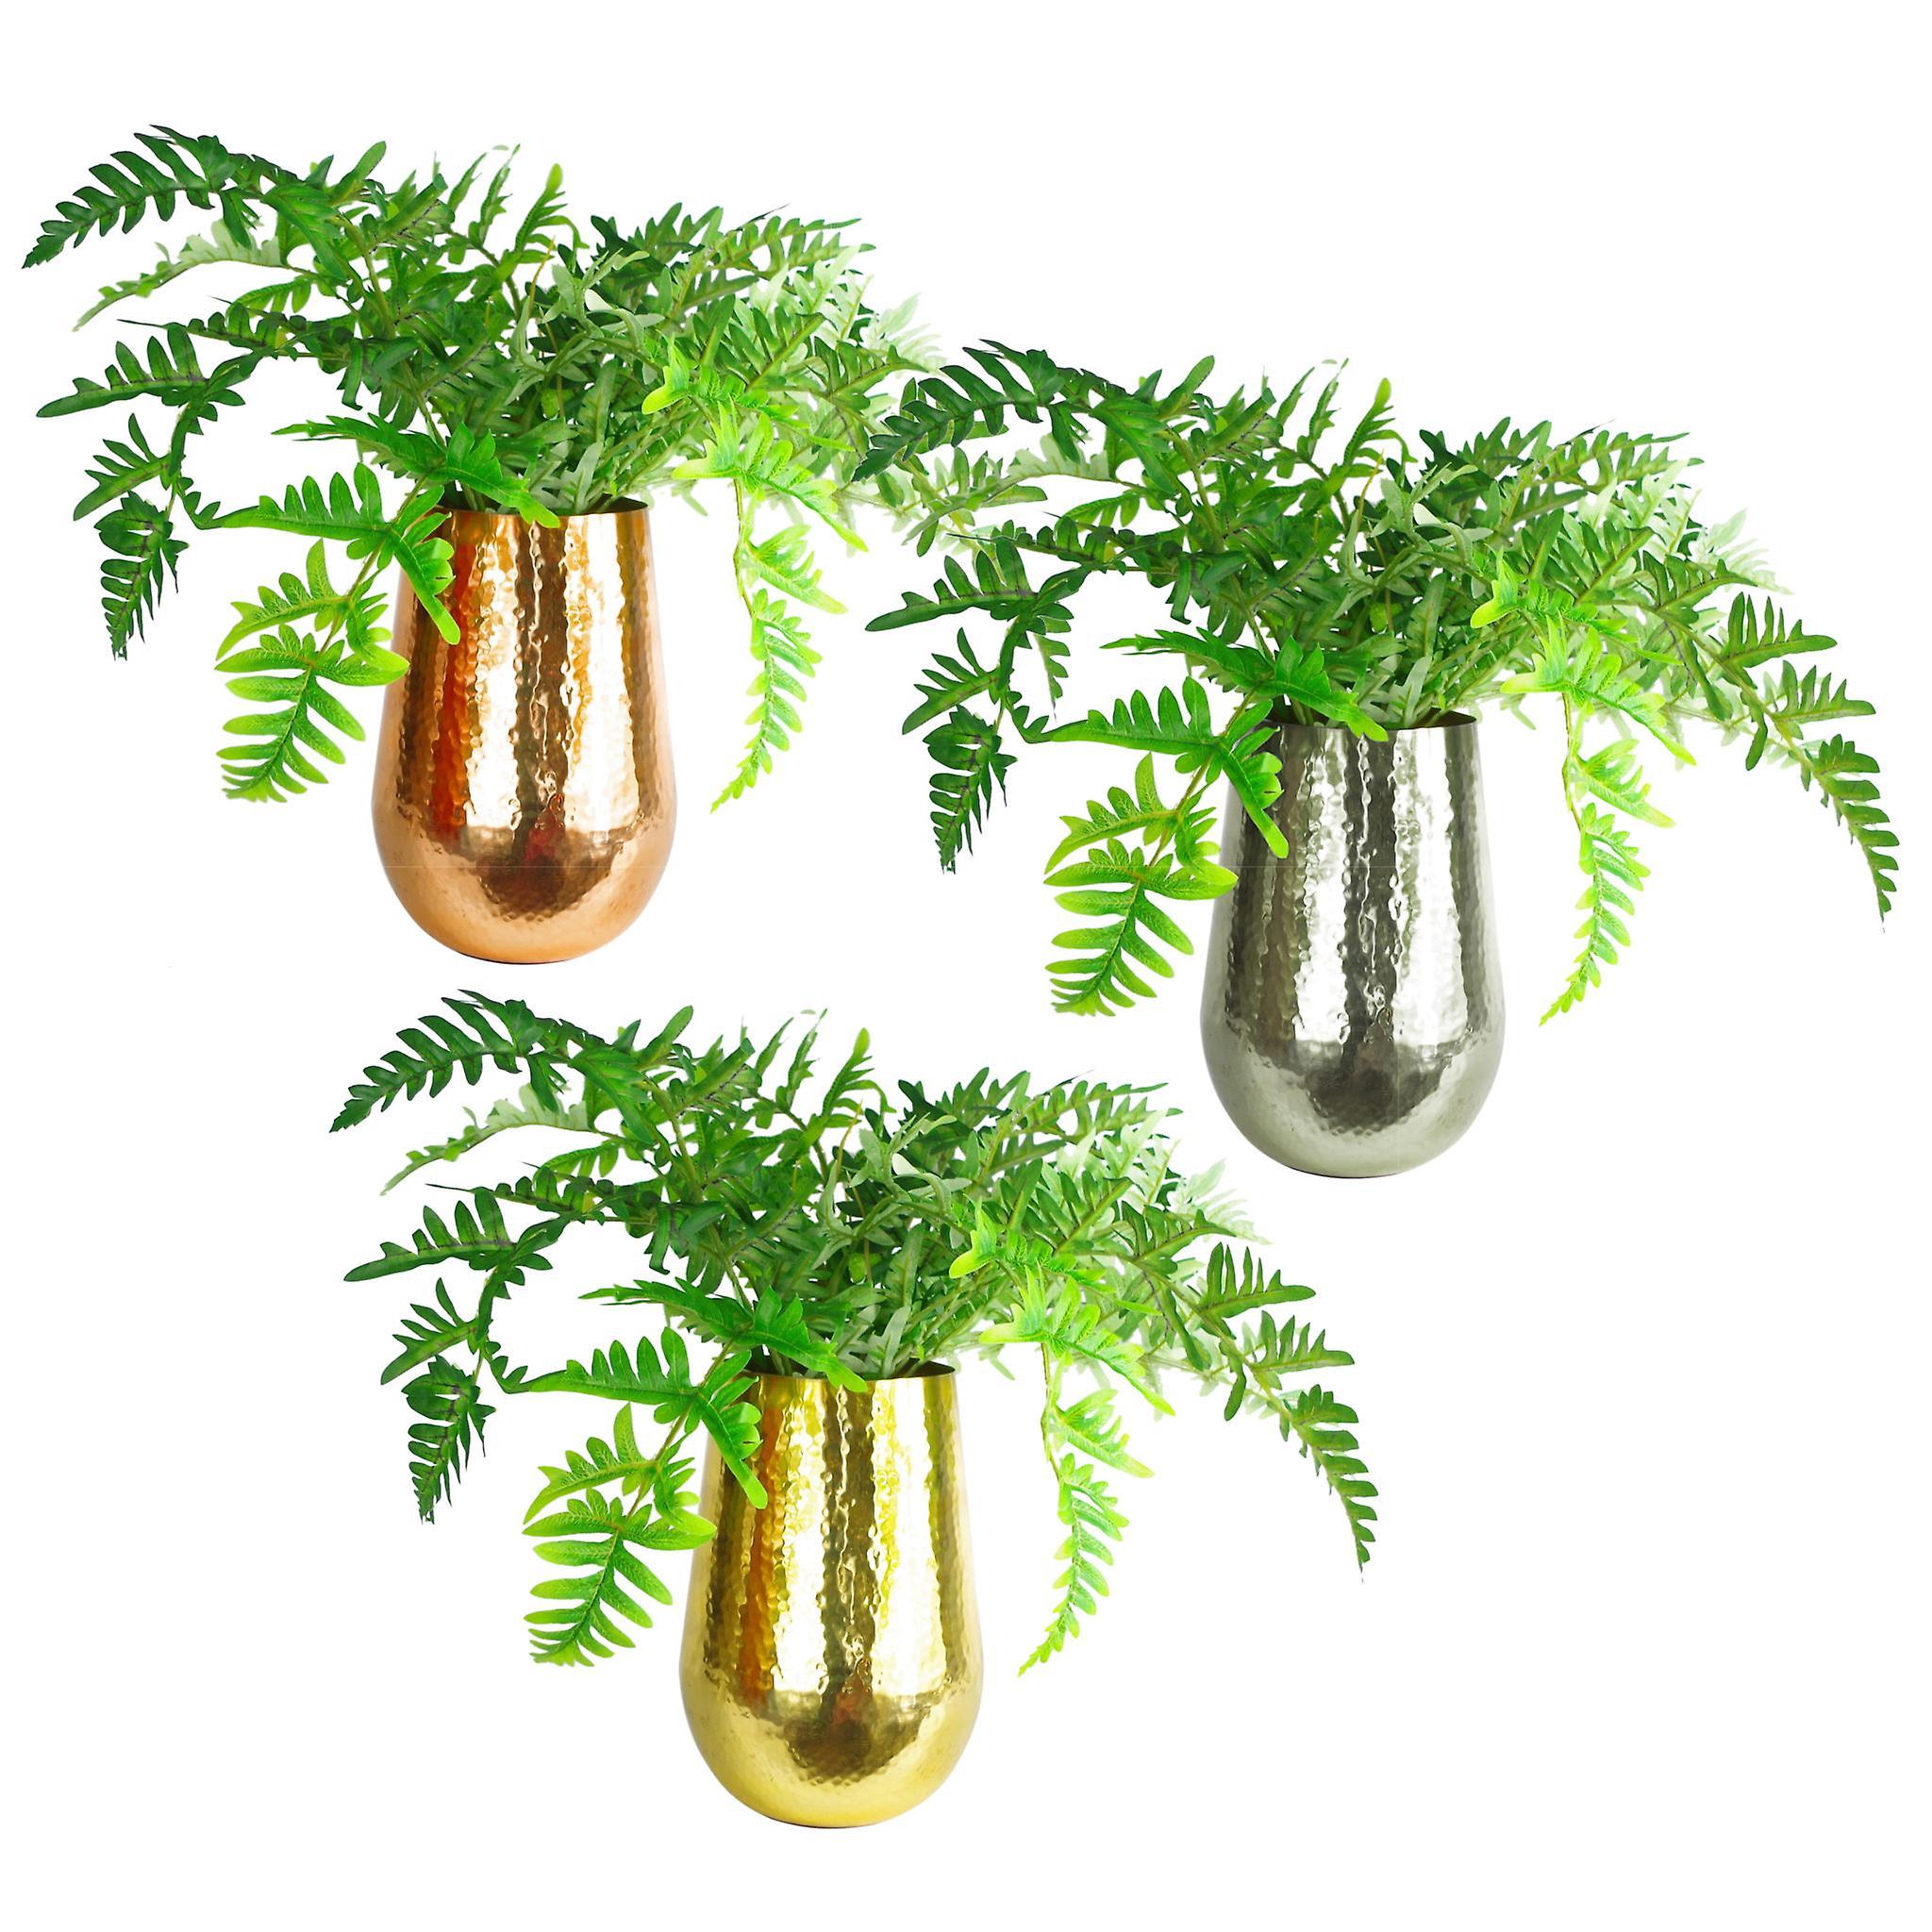 Leaf Tall Metal Gold Vase Planter Medium 17 x 25cm